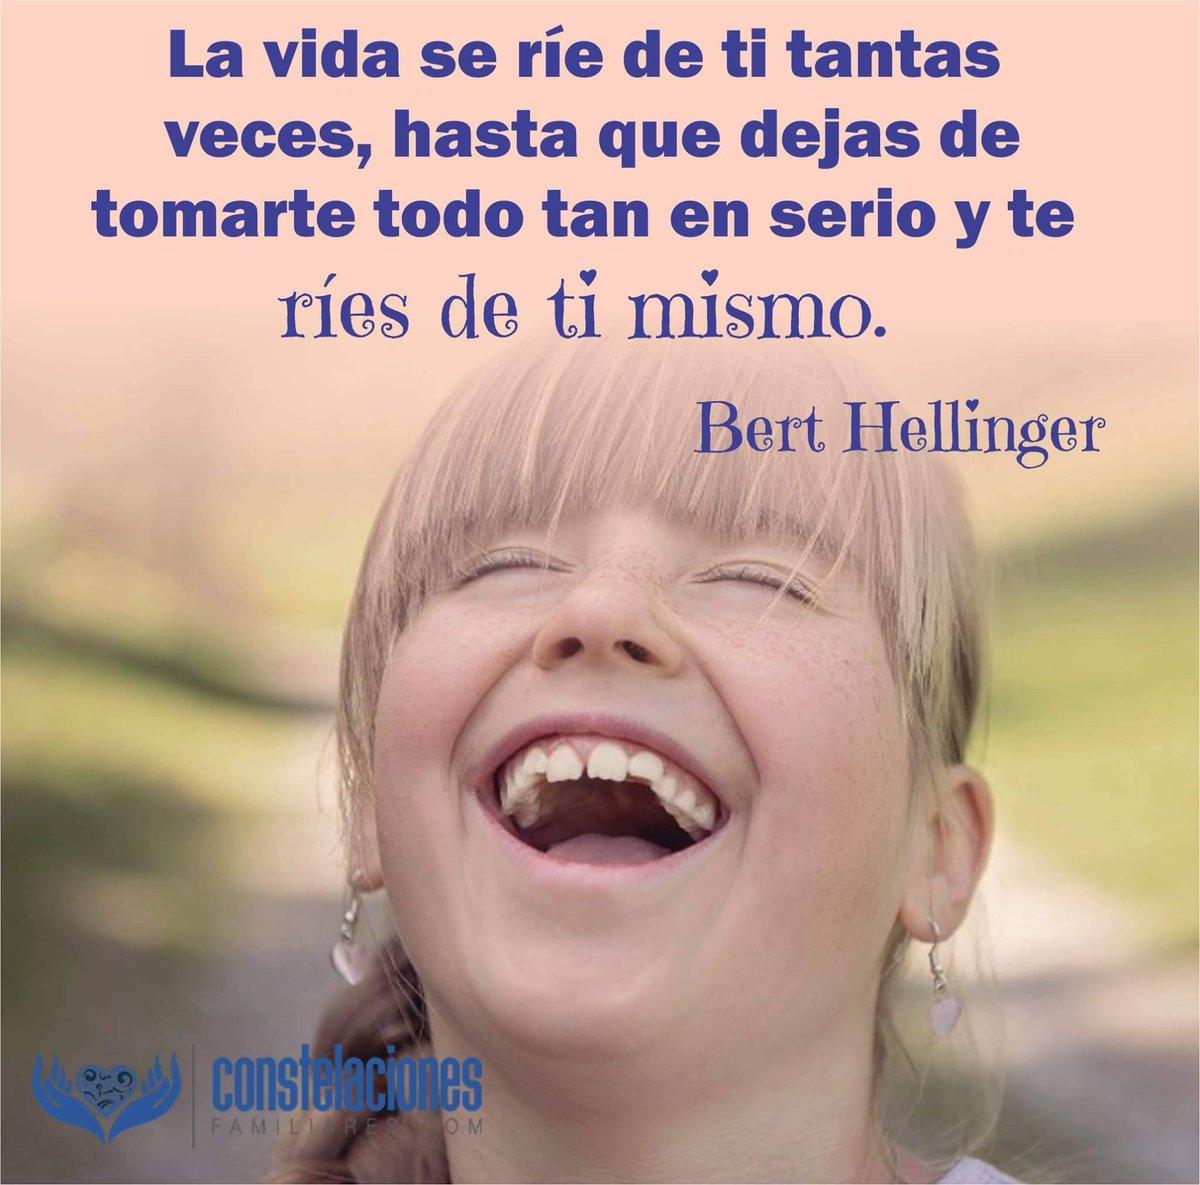 Bert Hellinger En Español On Twitter Esa Frase No Es De